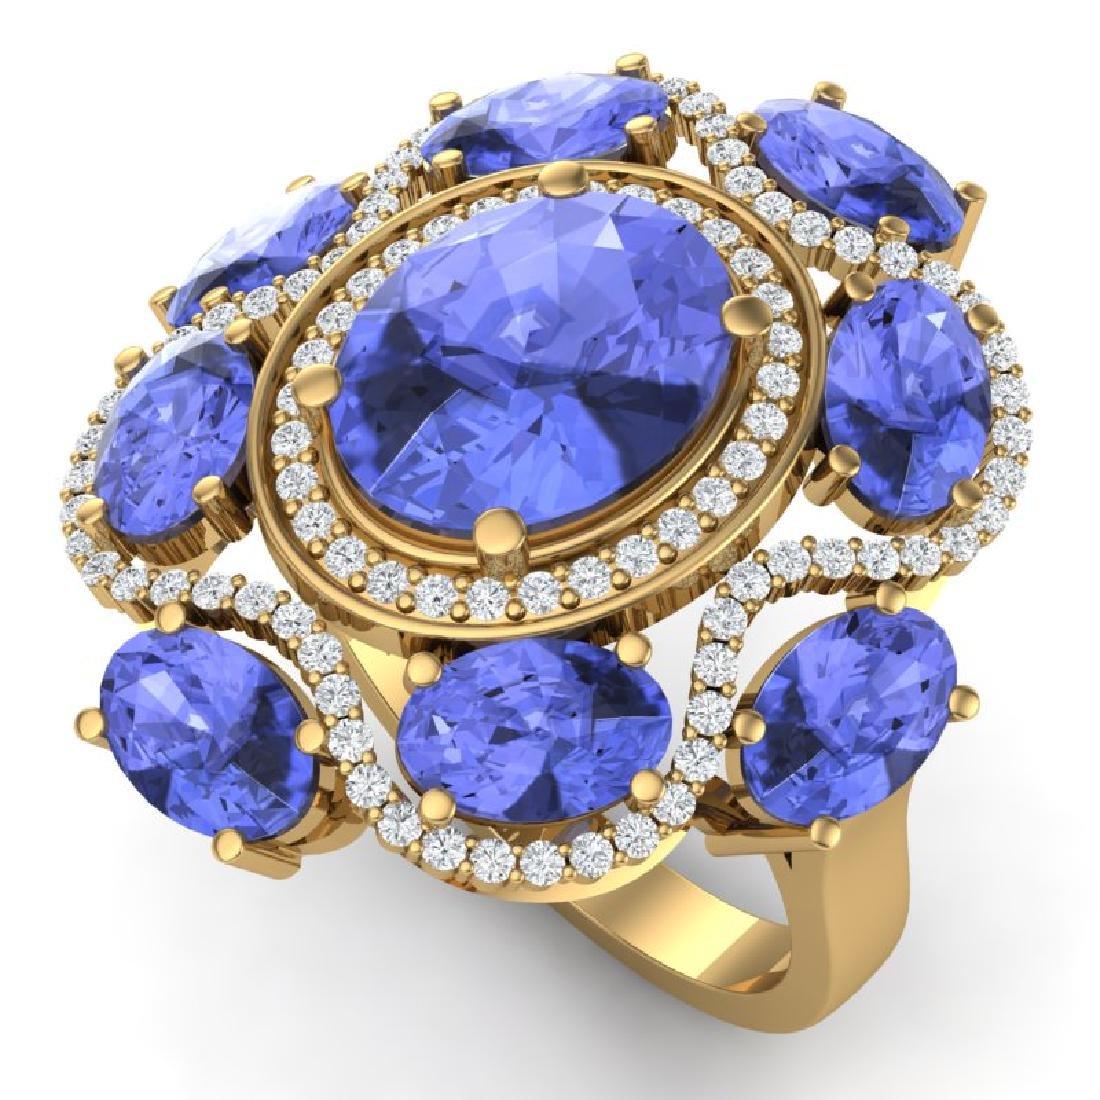 9.67 CTW Royalty Tanzanite & VS Diamond Ring 18K Yellow